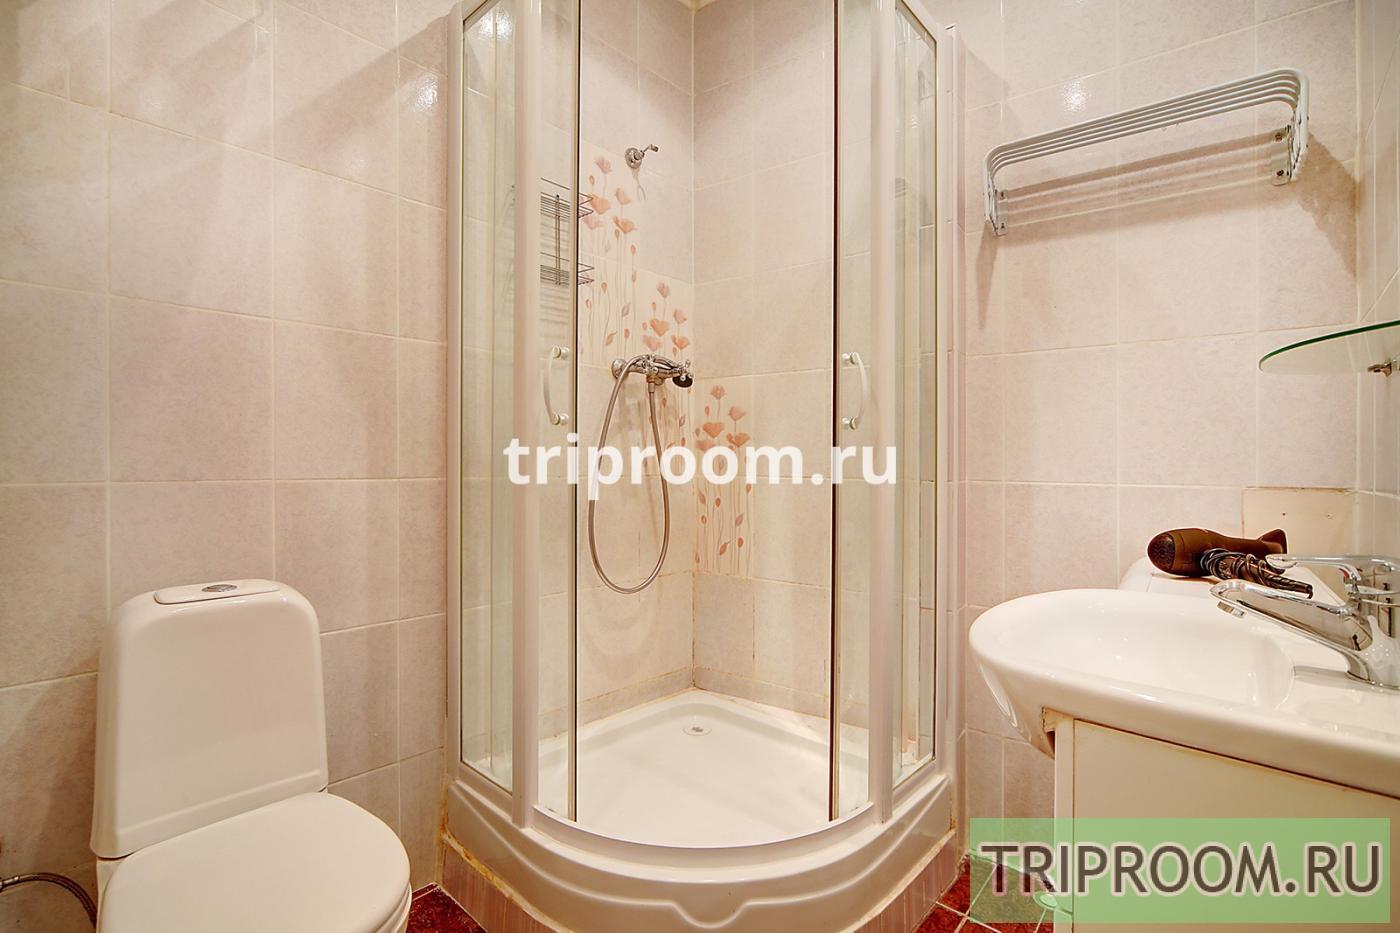 1-комнатная квартира посуточно (вариант № 15082), ул. Невский проспект, фото № 10